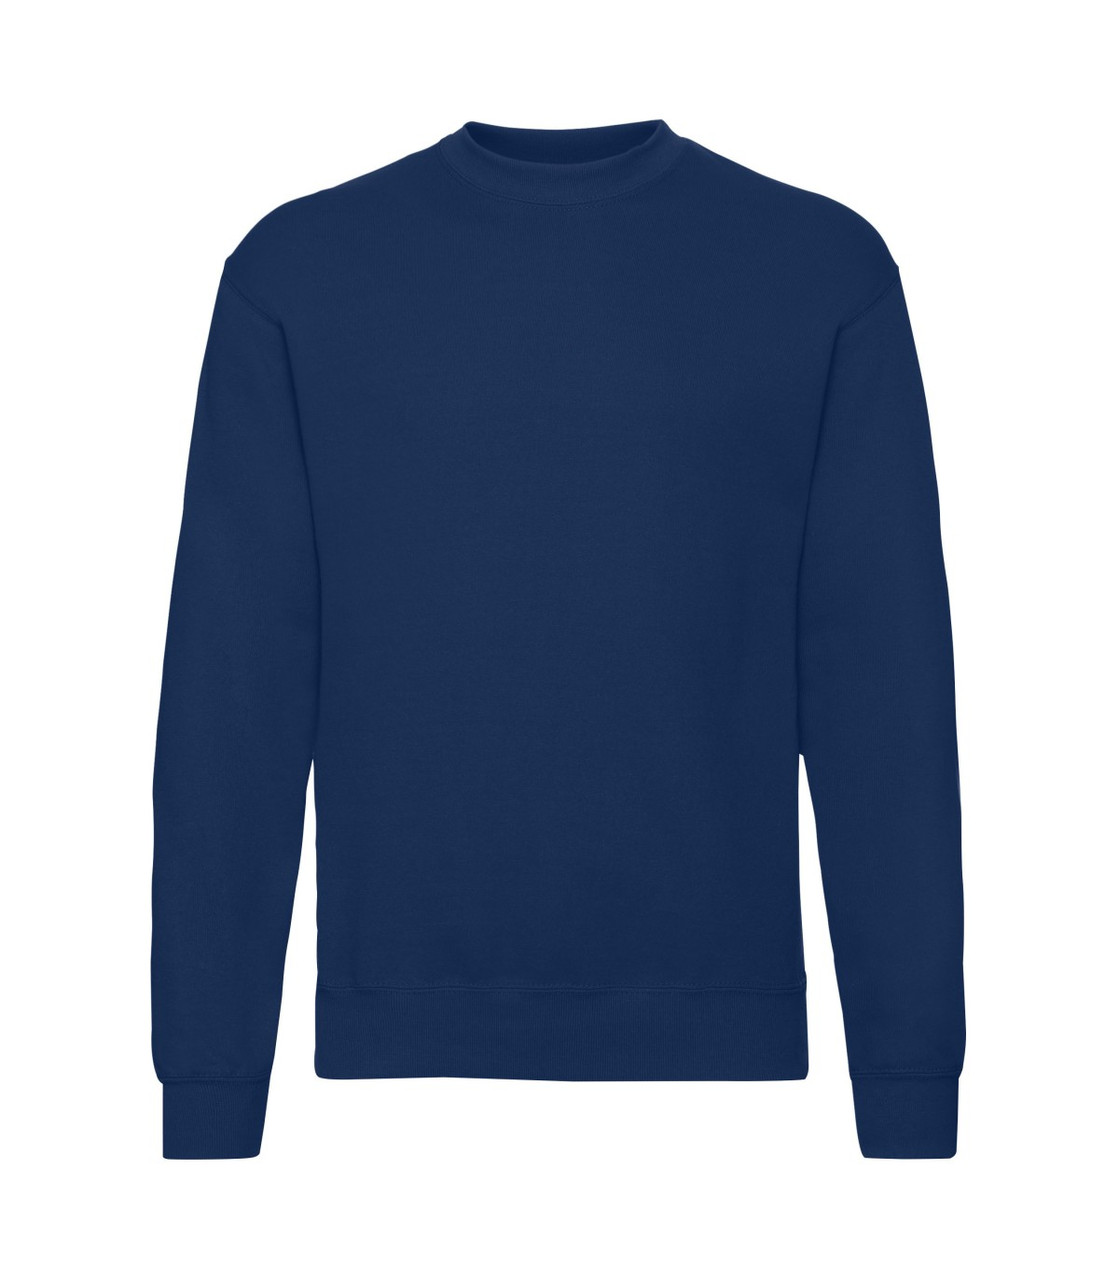 Мужской свитер-реглан темно-синий 202-32